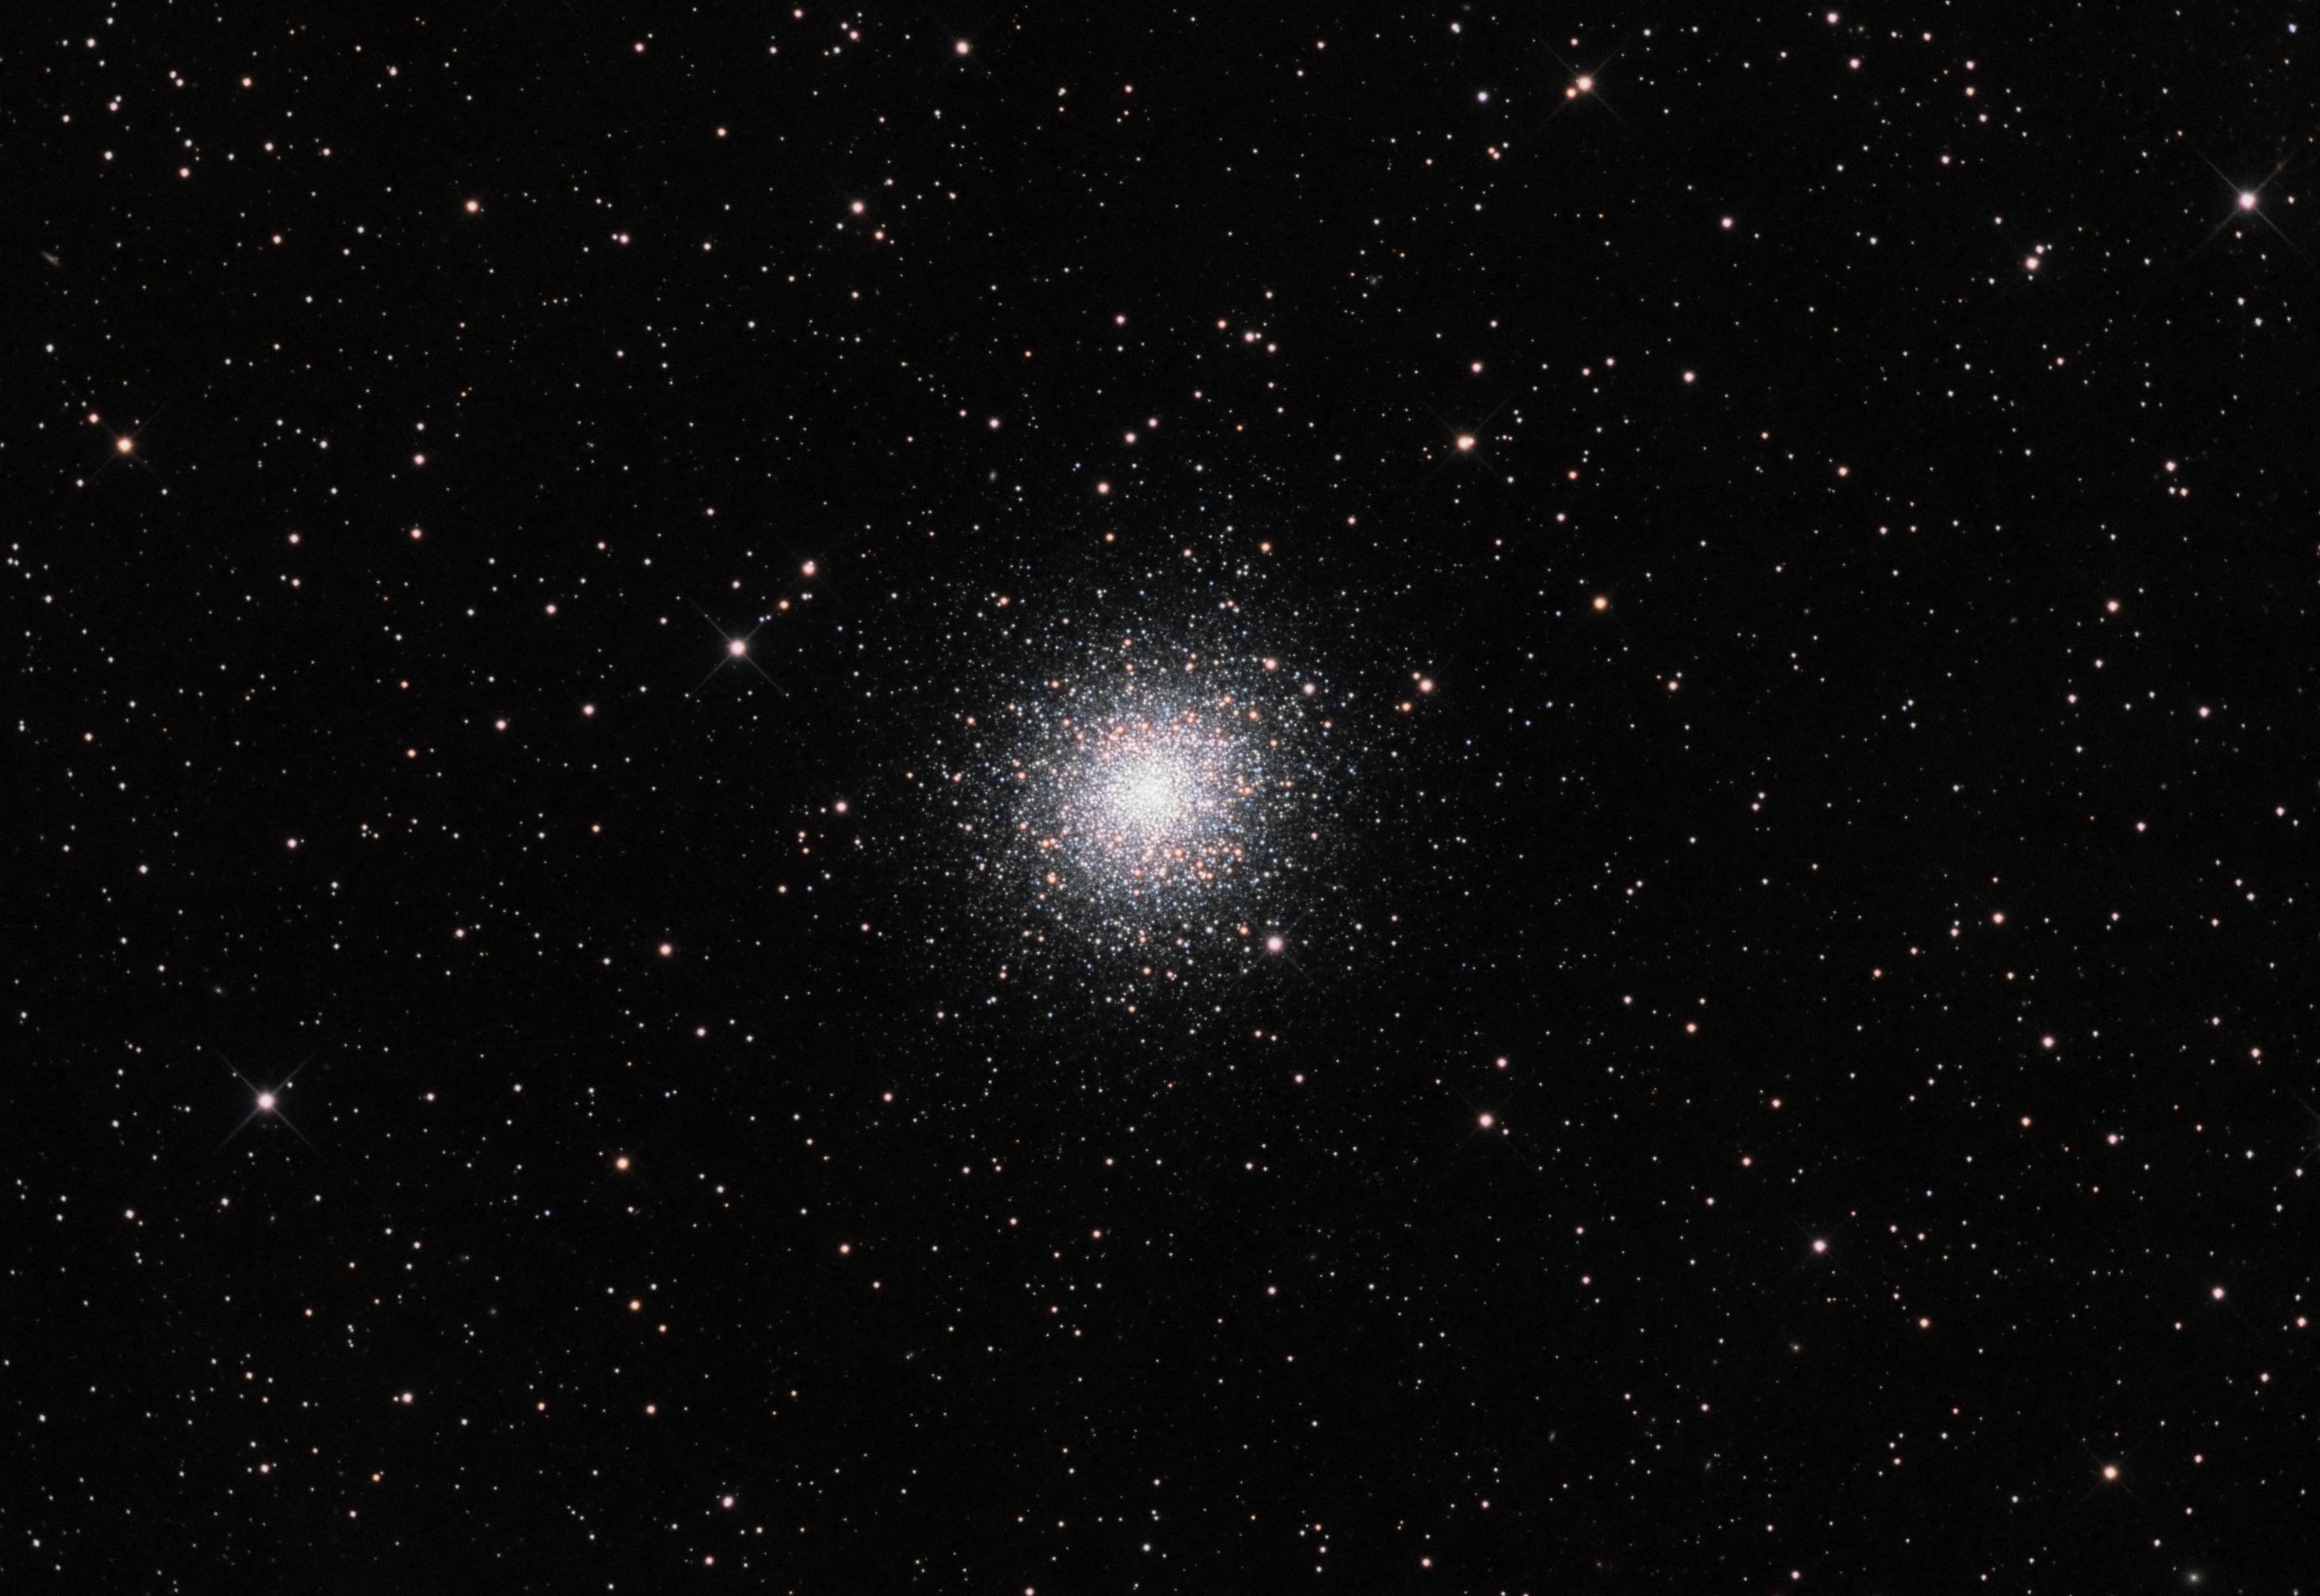 Splash of Stars! Sparkling Globular Cluster Wows Skywatcher